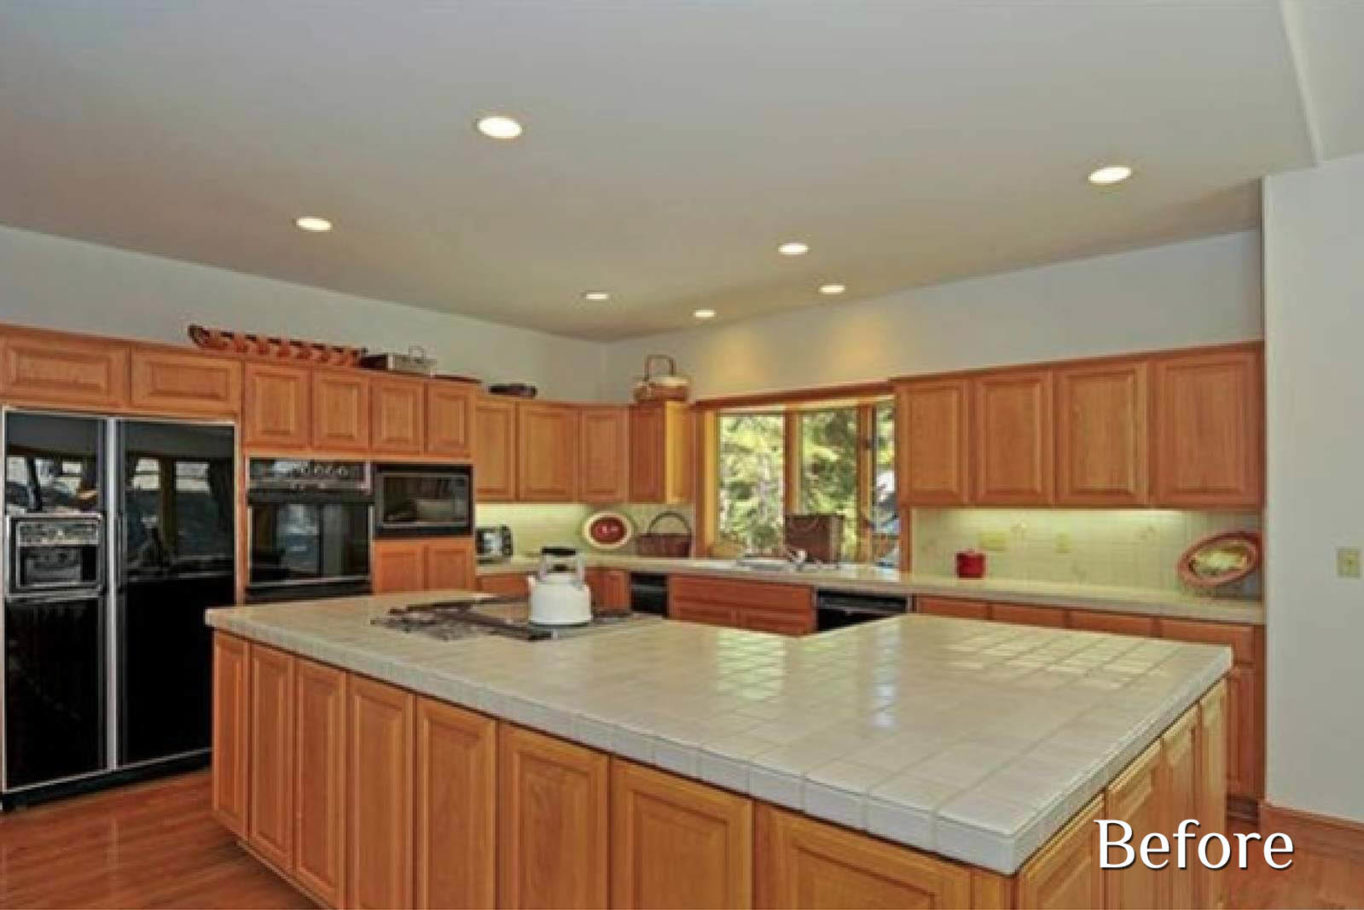 Kitchen before remodel - Talie Jane Interiors